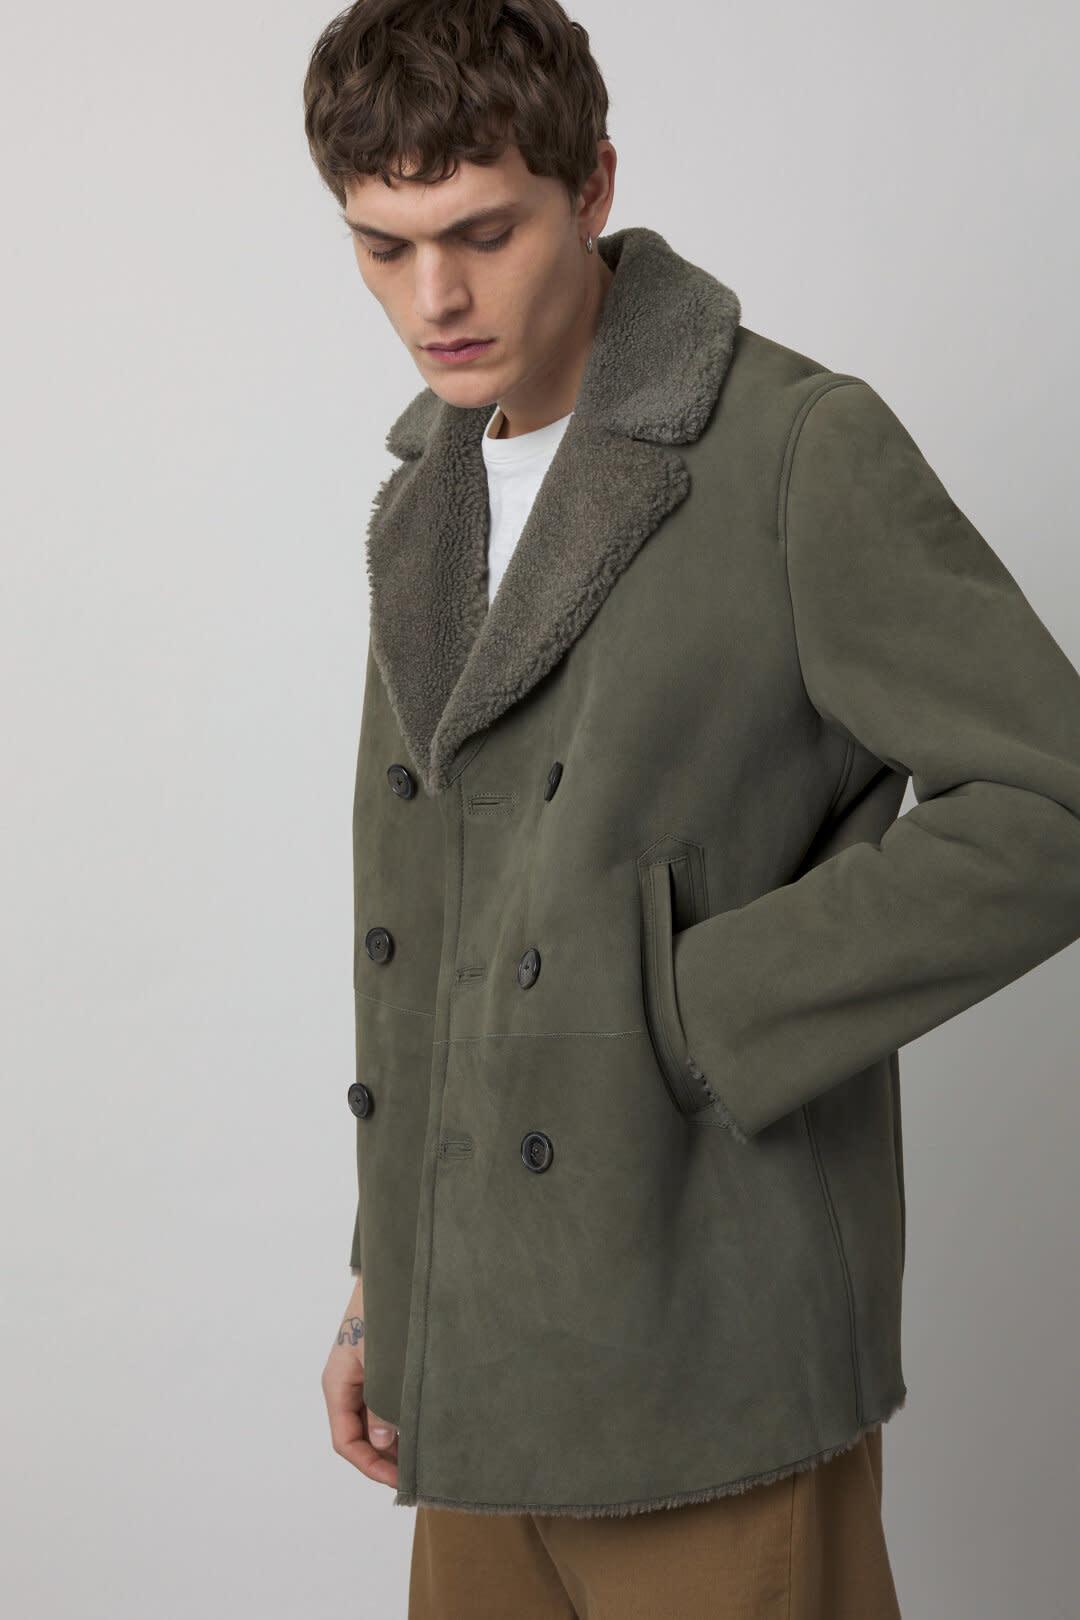 Shearling Jacket Muddy beige-2